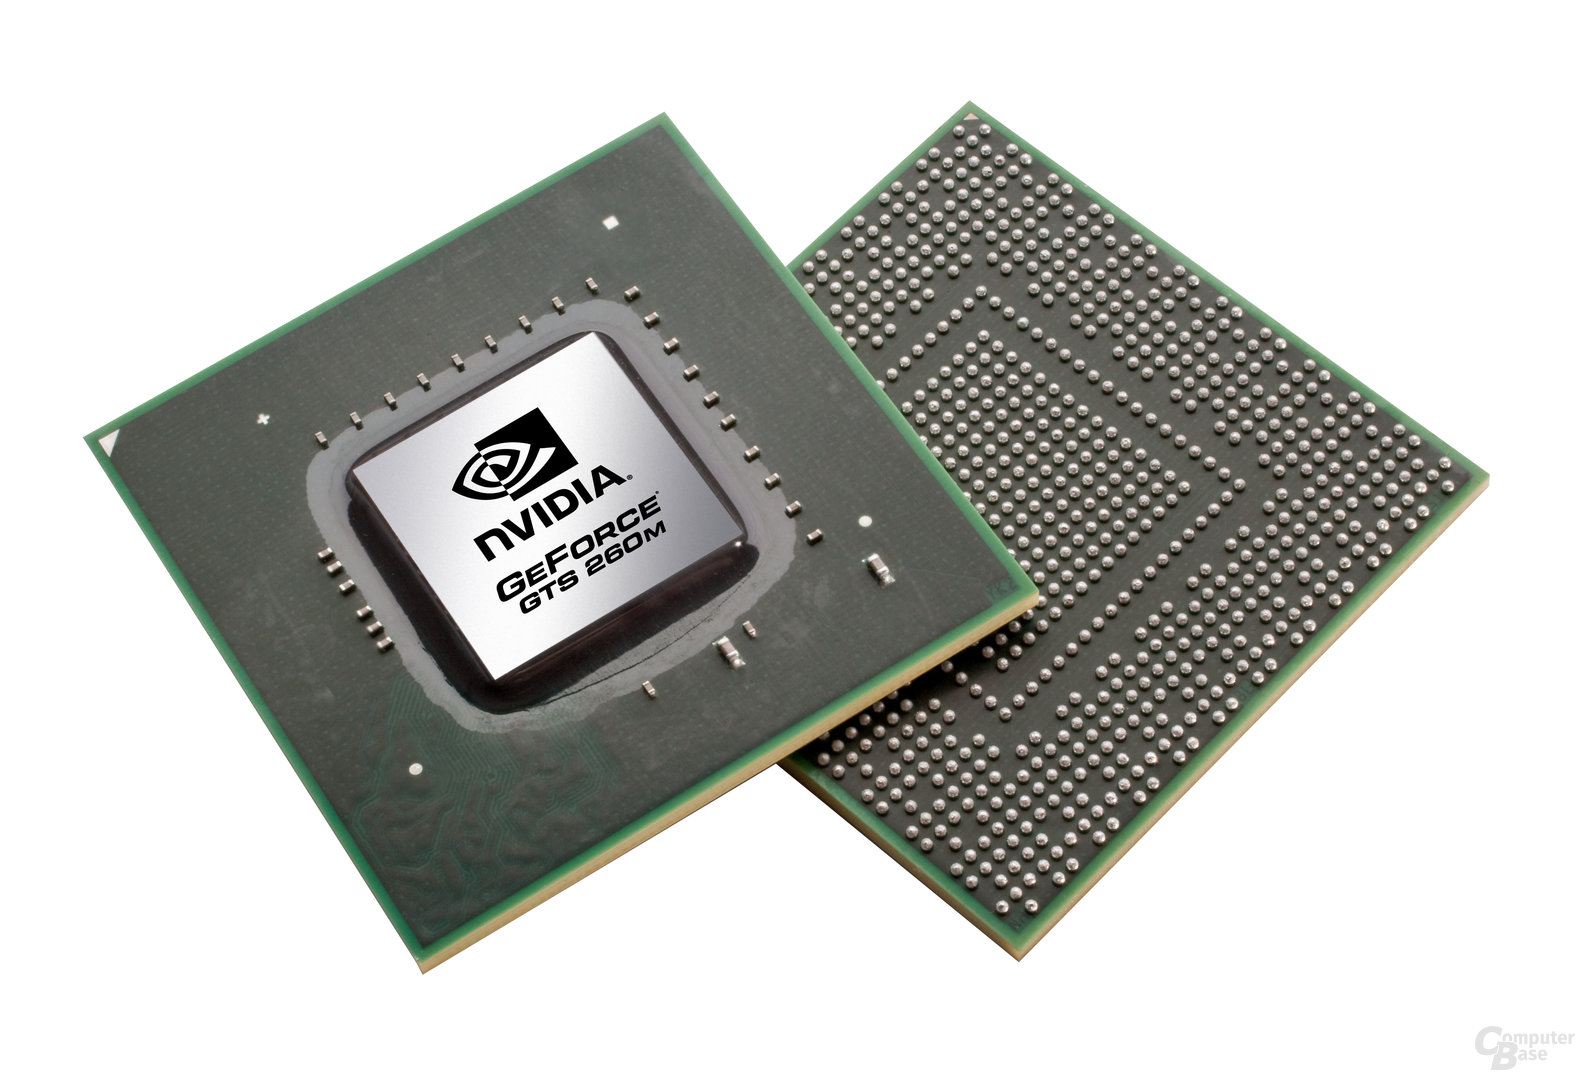 GeForce GTS 260M